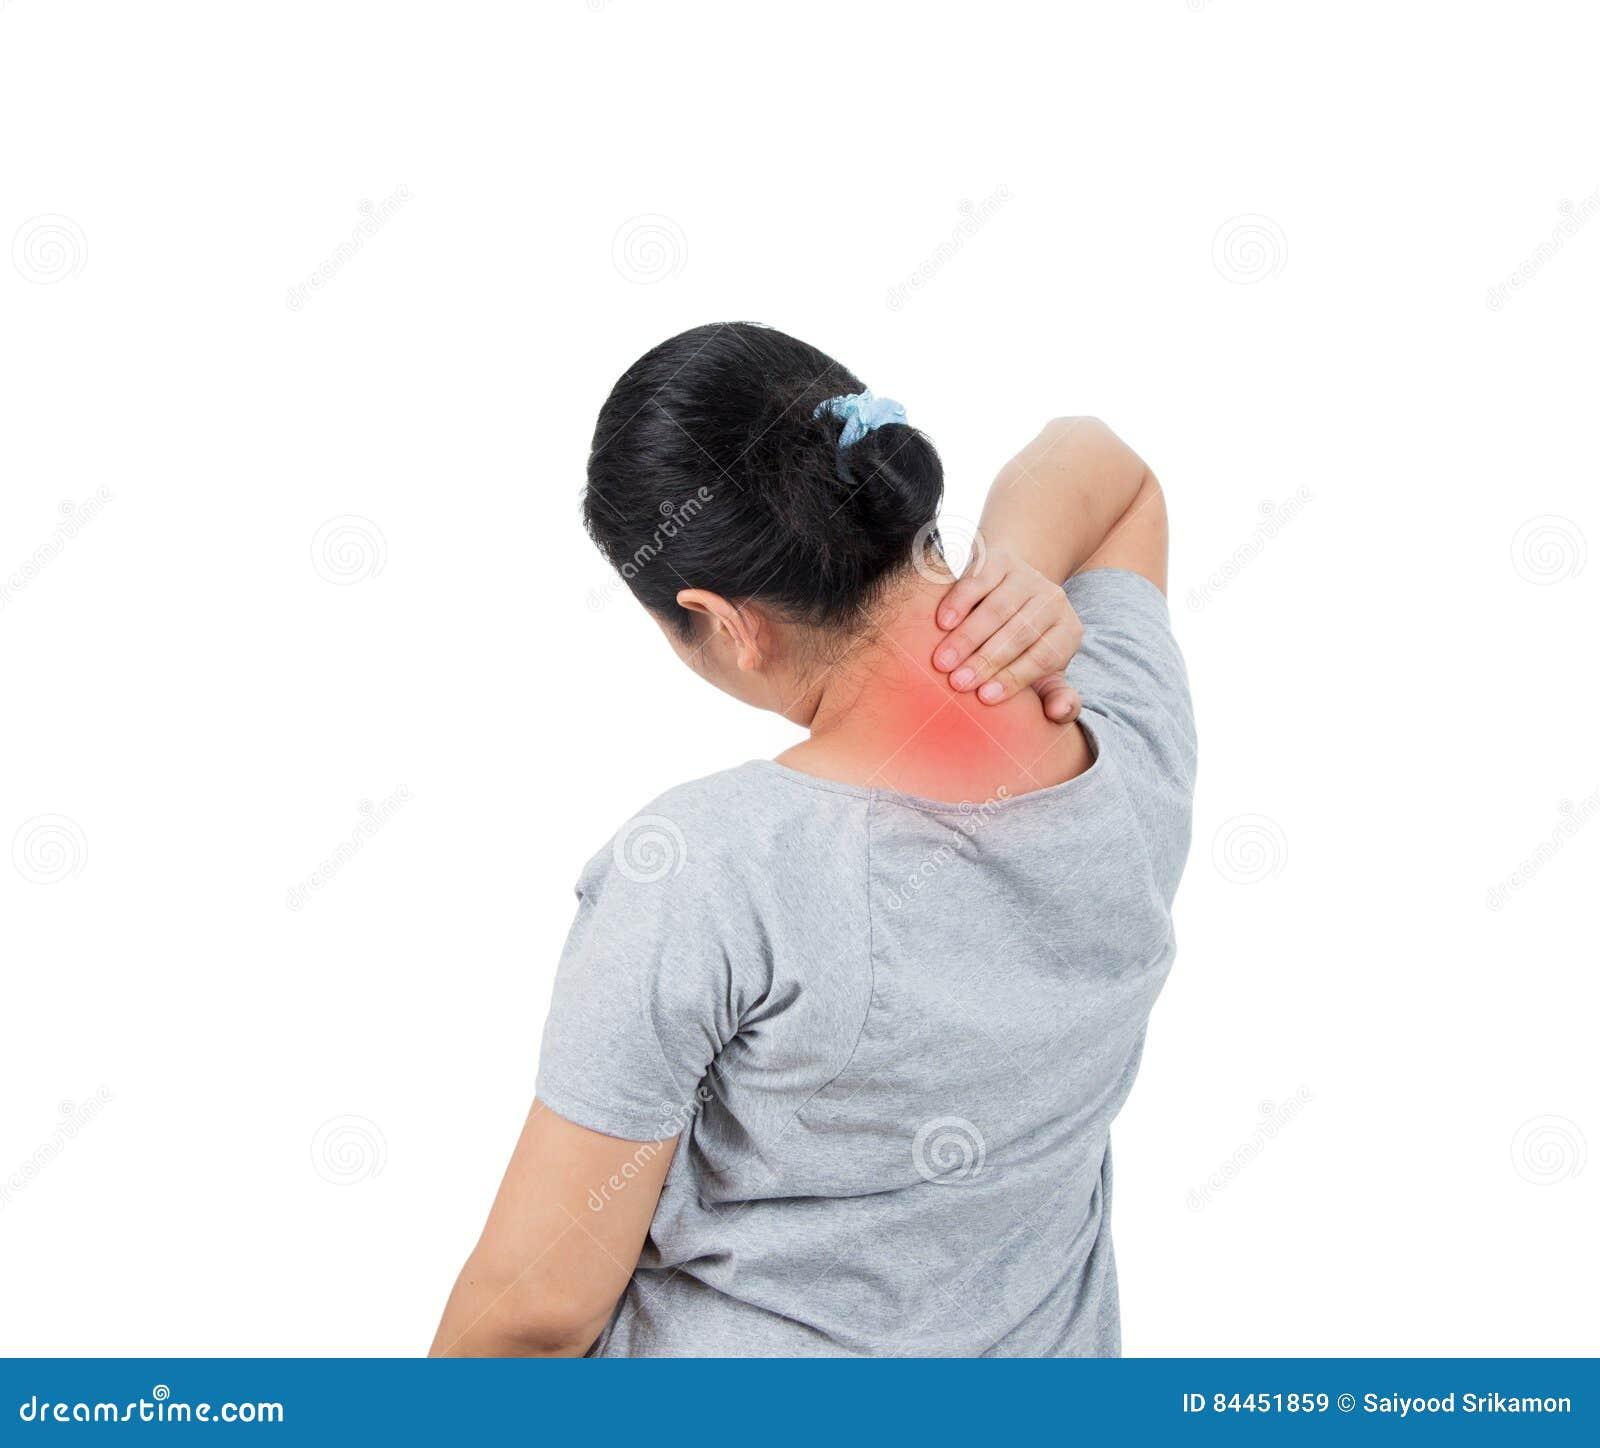 women has neck pain.